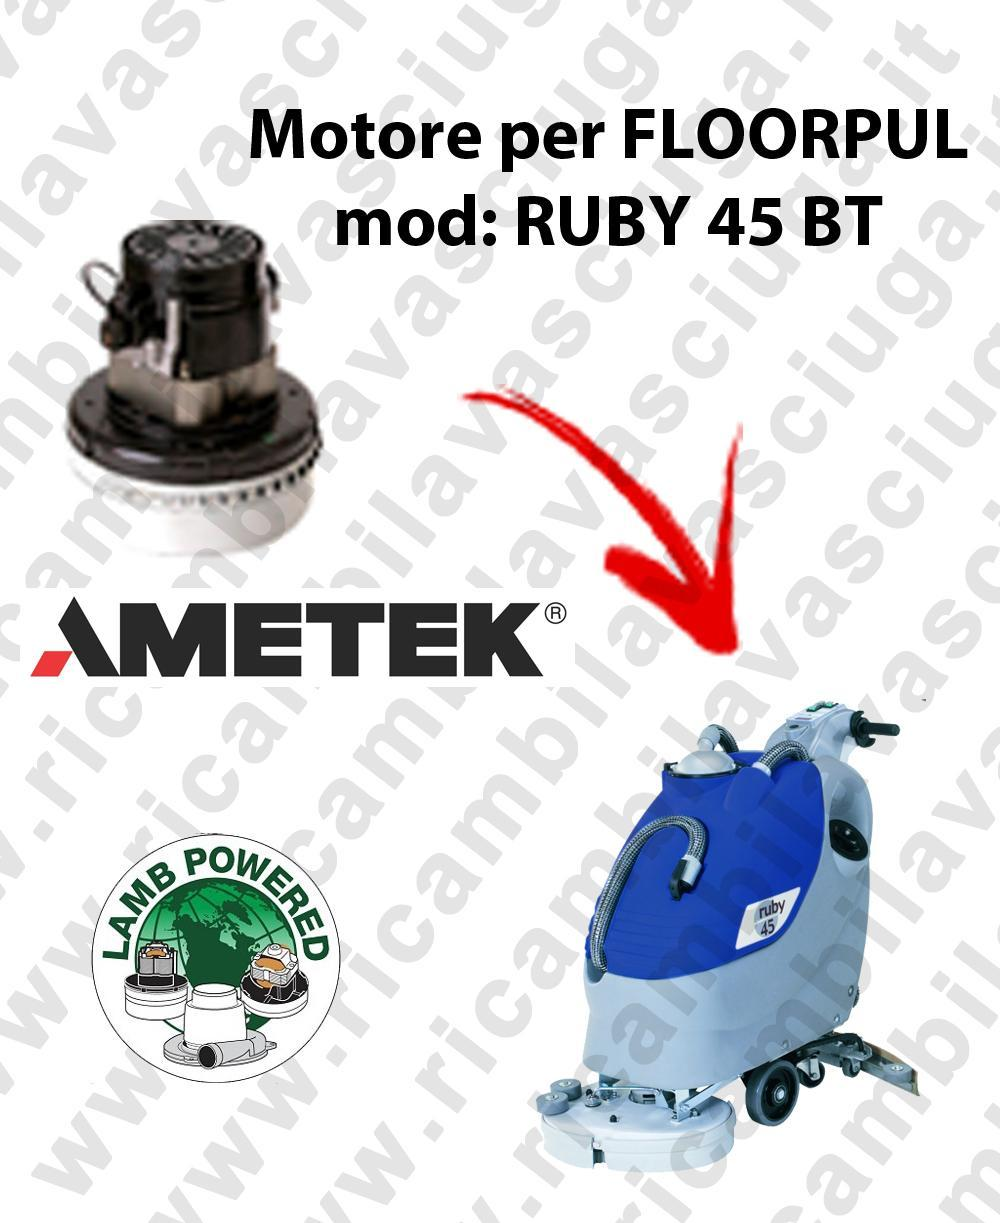 RUBY 45 BT Motore de aspiración LAMB AMETEK para fregadora FLOORPUL